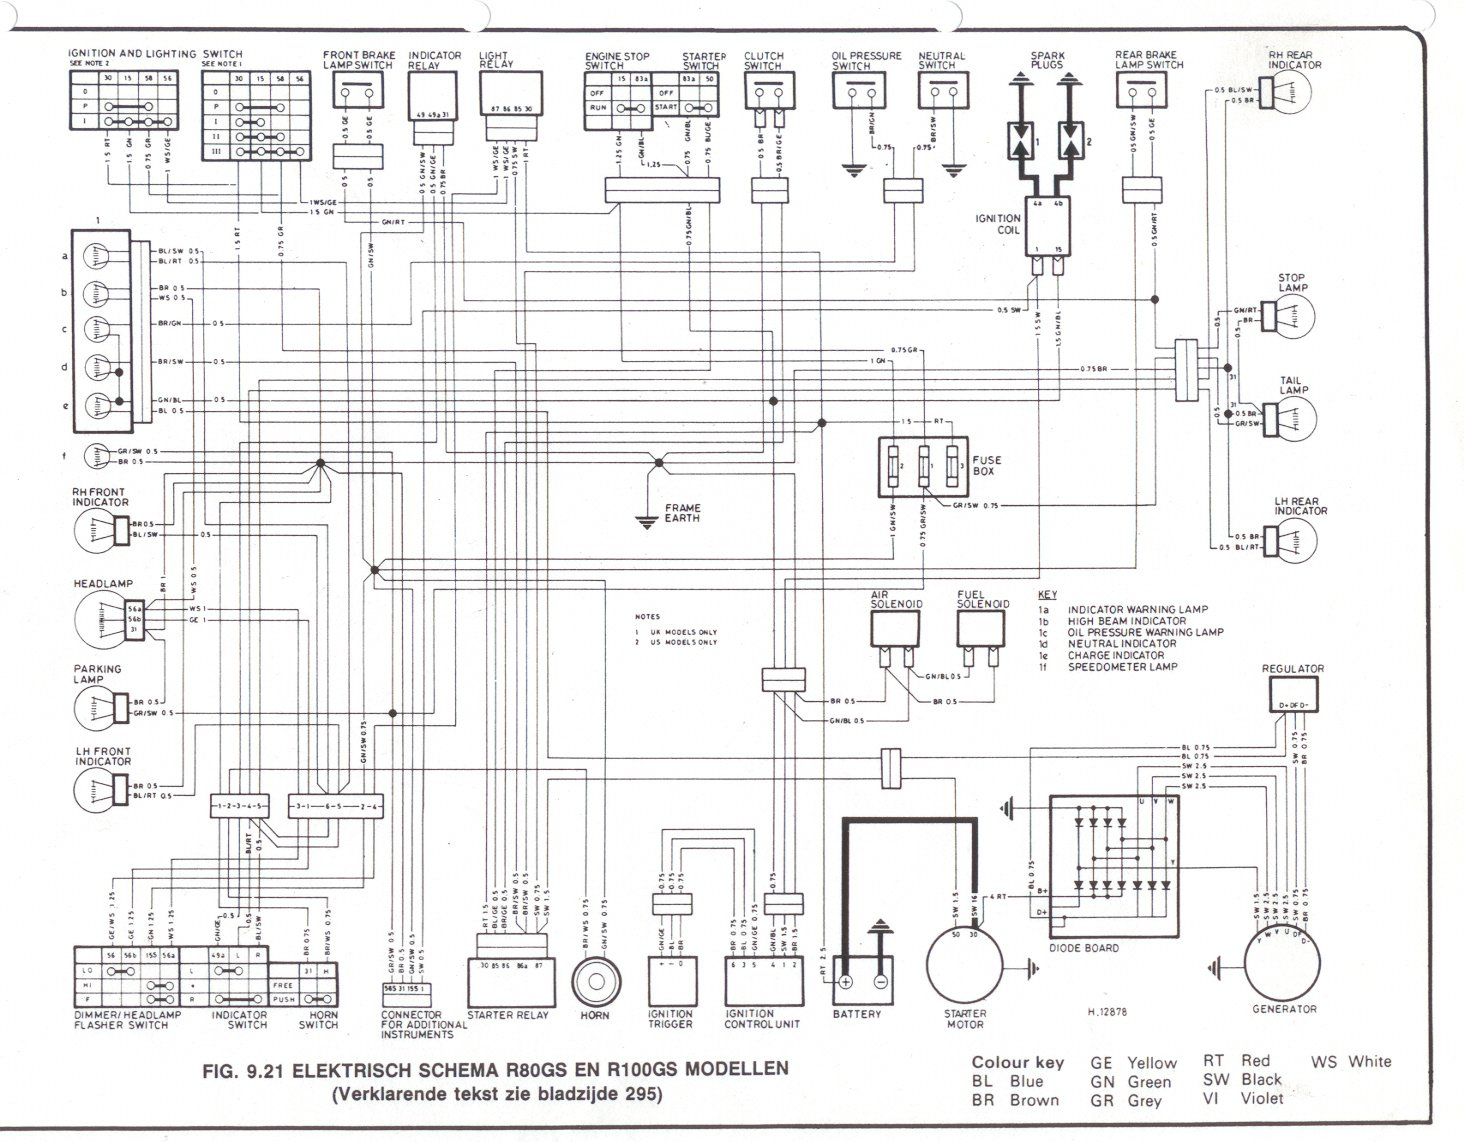 1995 tvr chimaera ignition fuse box diagram